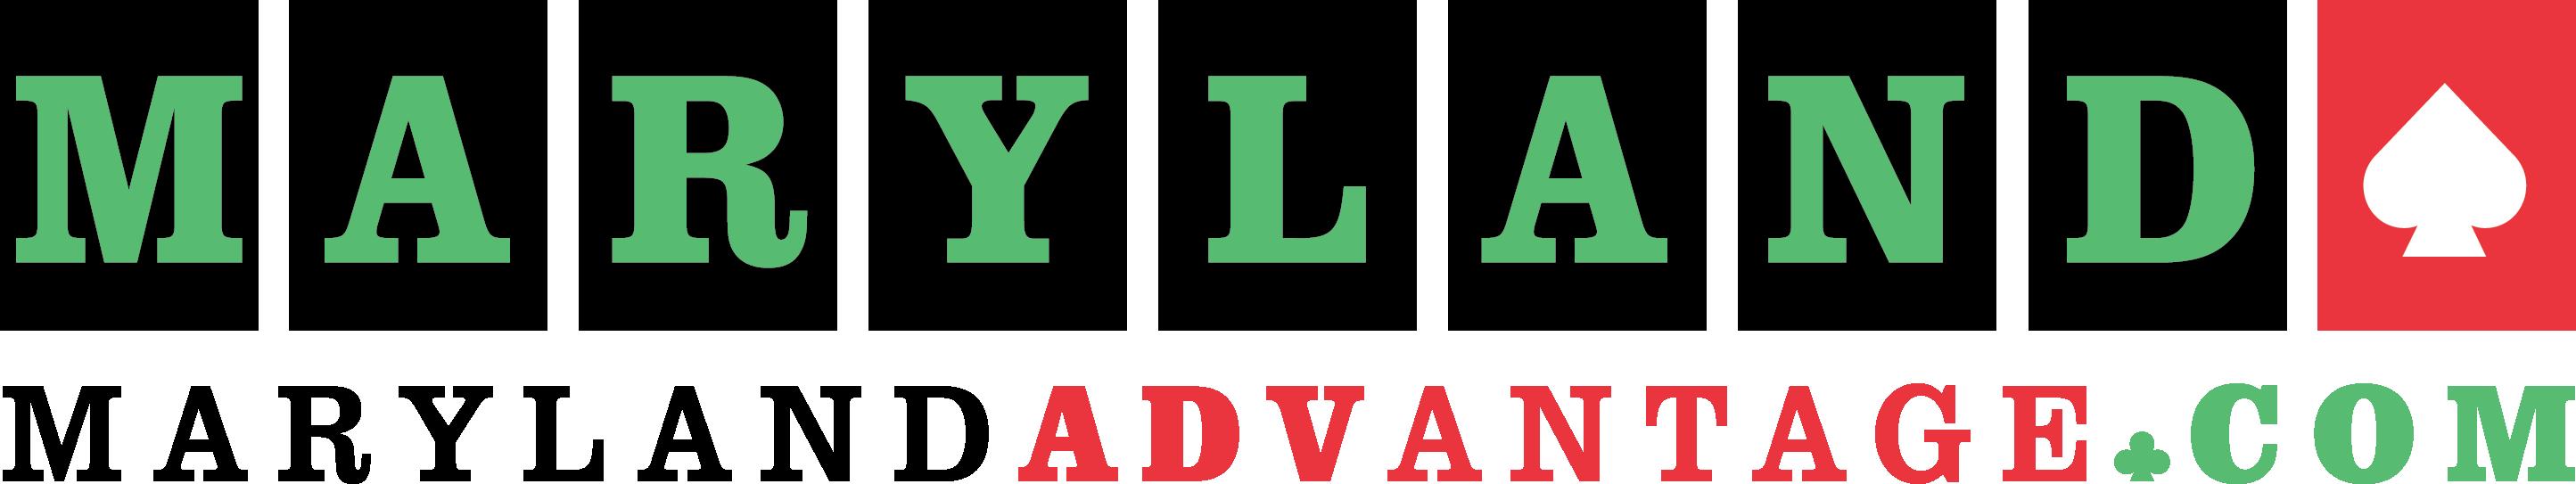 Maryland Advantage